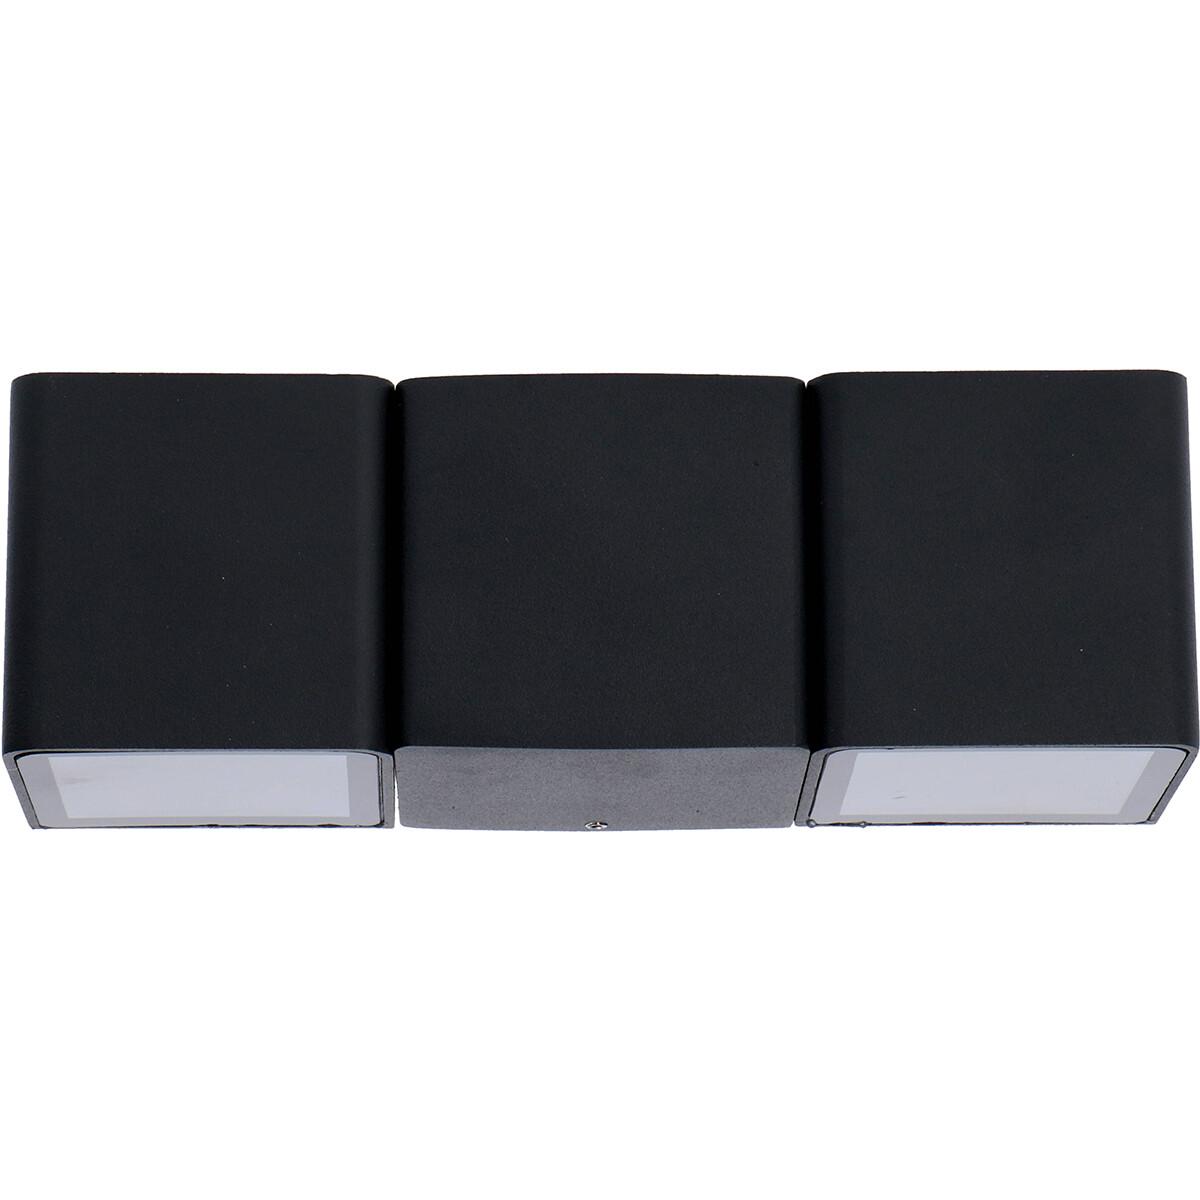 LED Tuinverlichting - Buitenlamp - Sanola Hiptro - 6W - Warm Wit 2700K - Rond - Mat Zwart - Aluminium